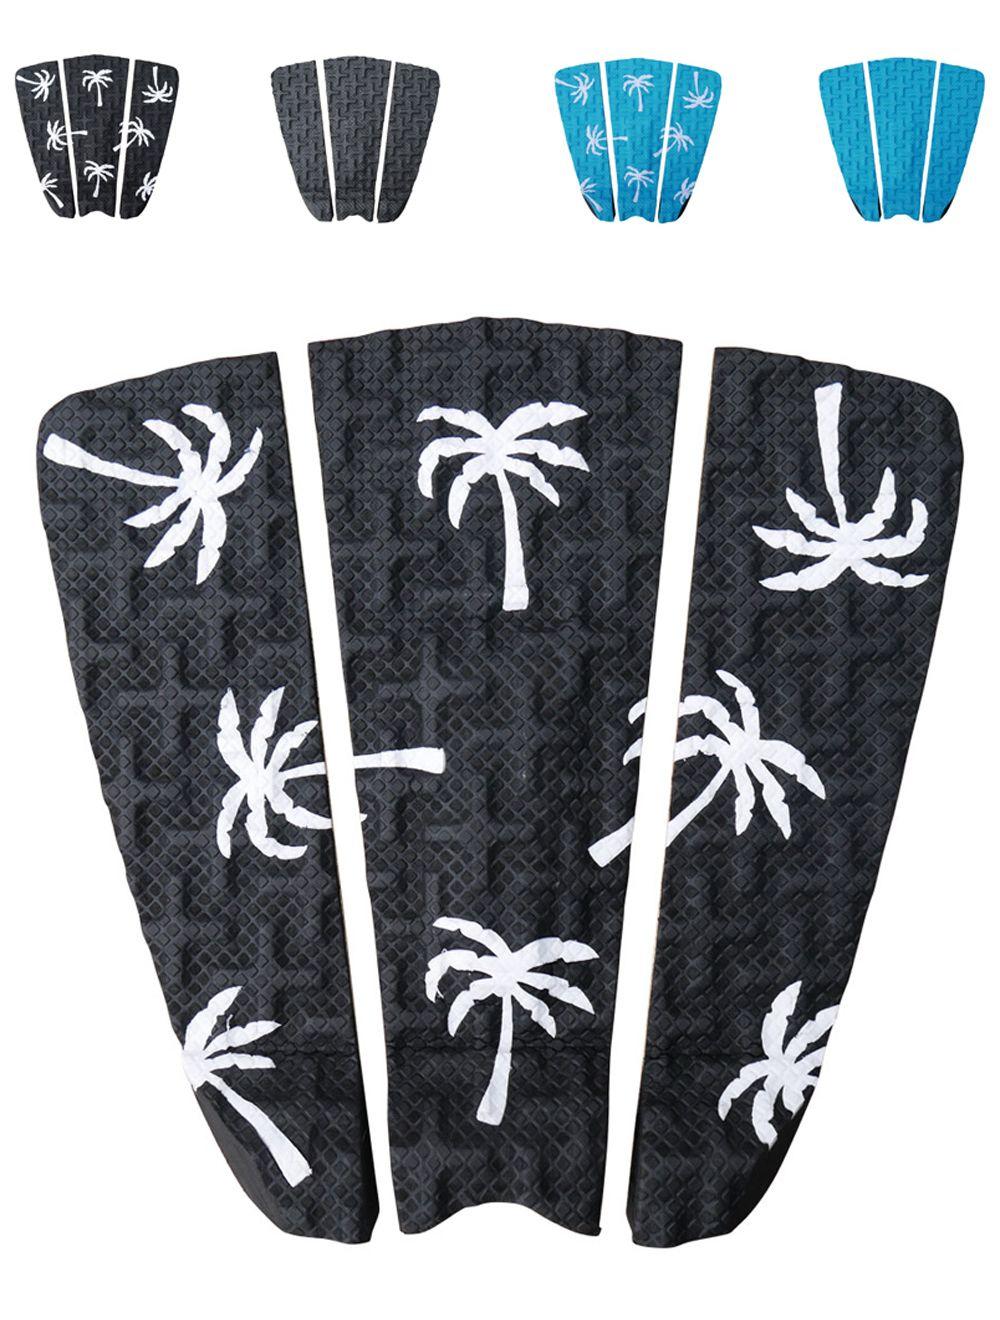 Traction Pad Pads für Surfboard